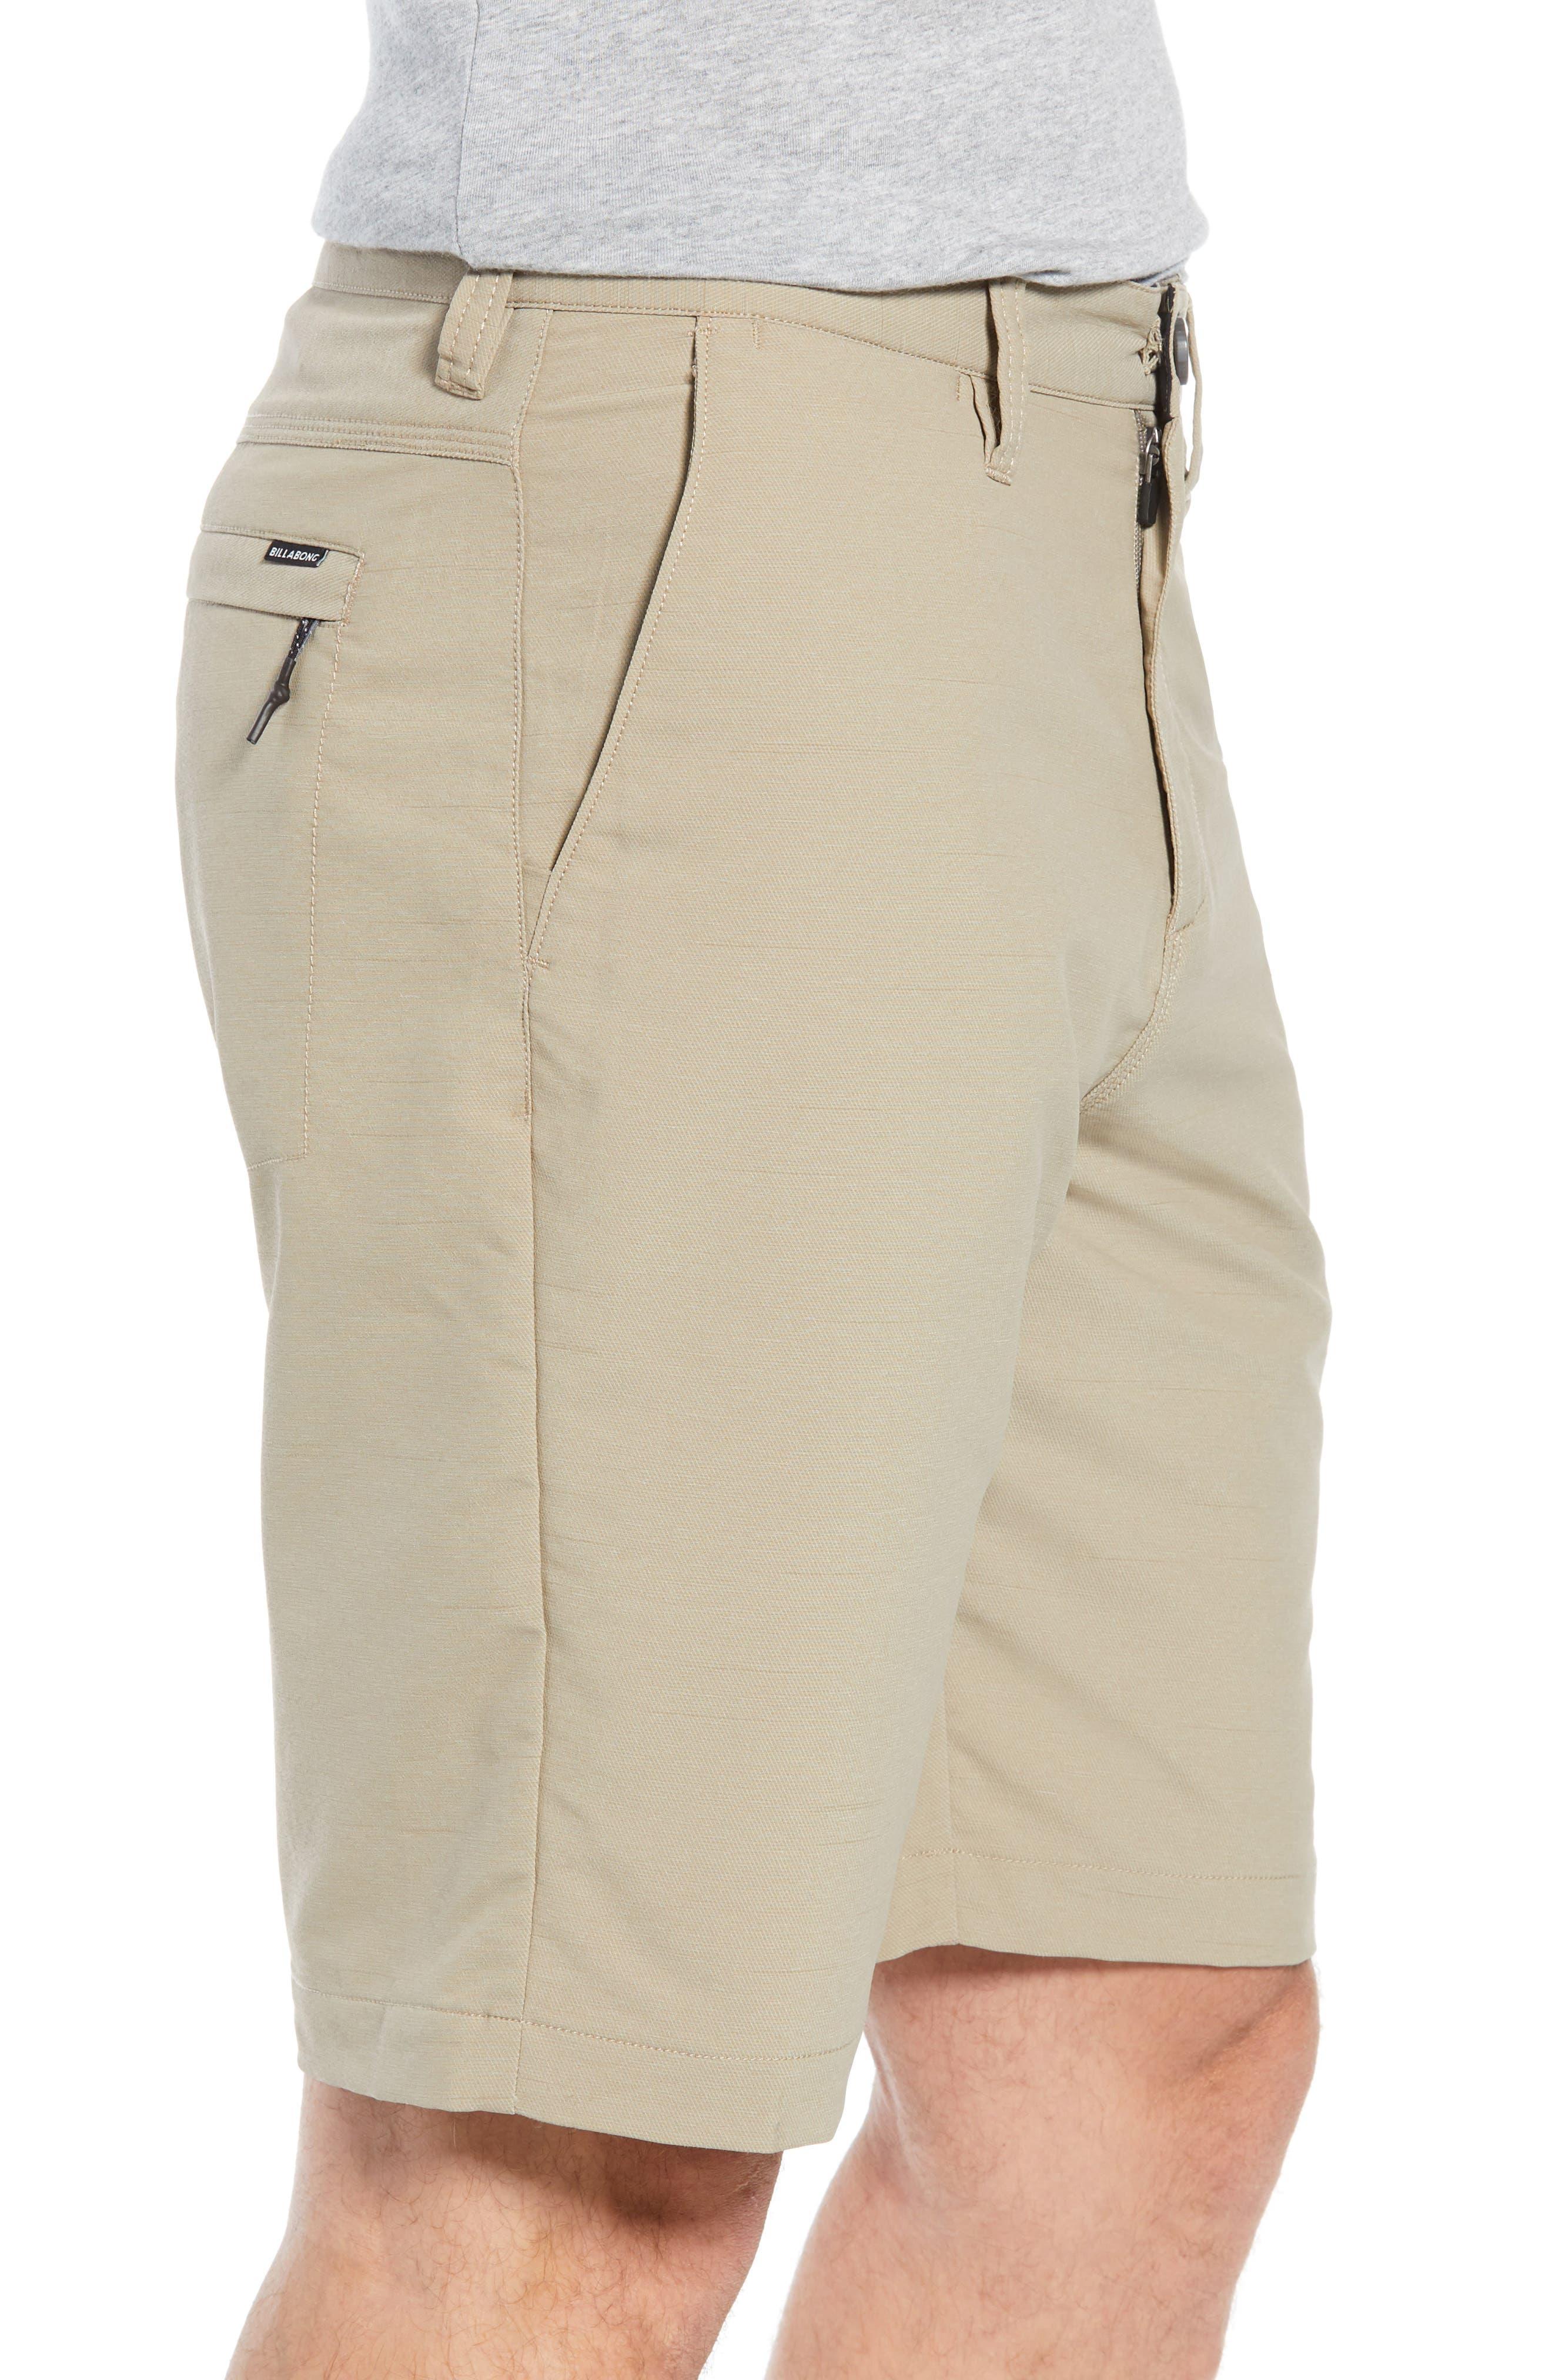 Surfreak Hybrid Shorts,                             Alternate thumbnail 3, color,                             KHAKI